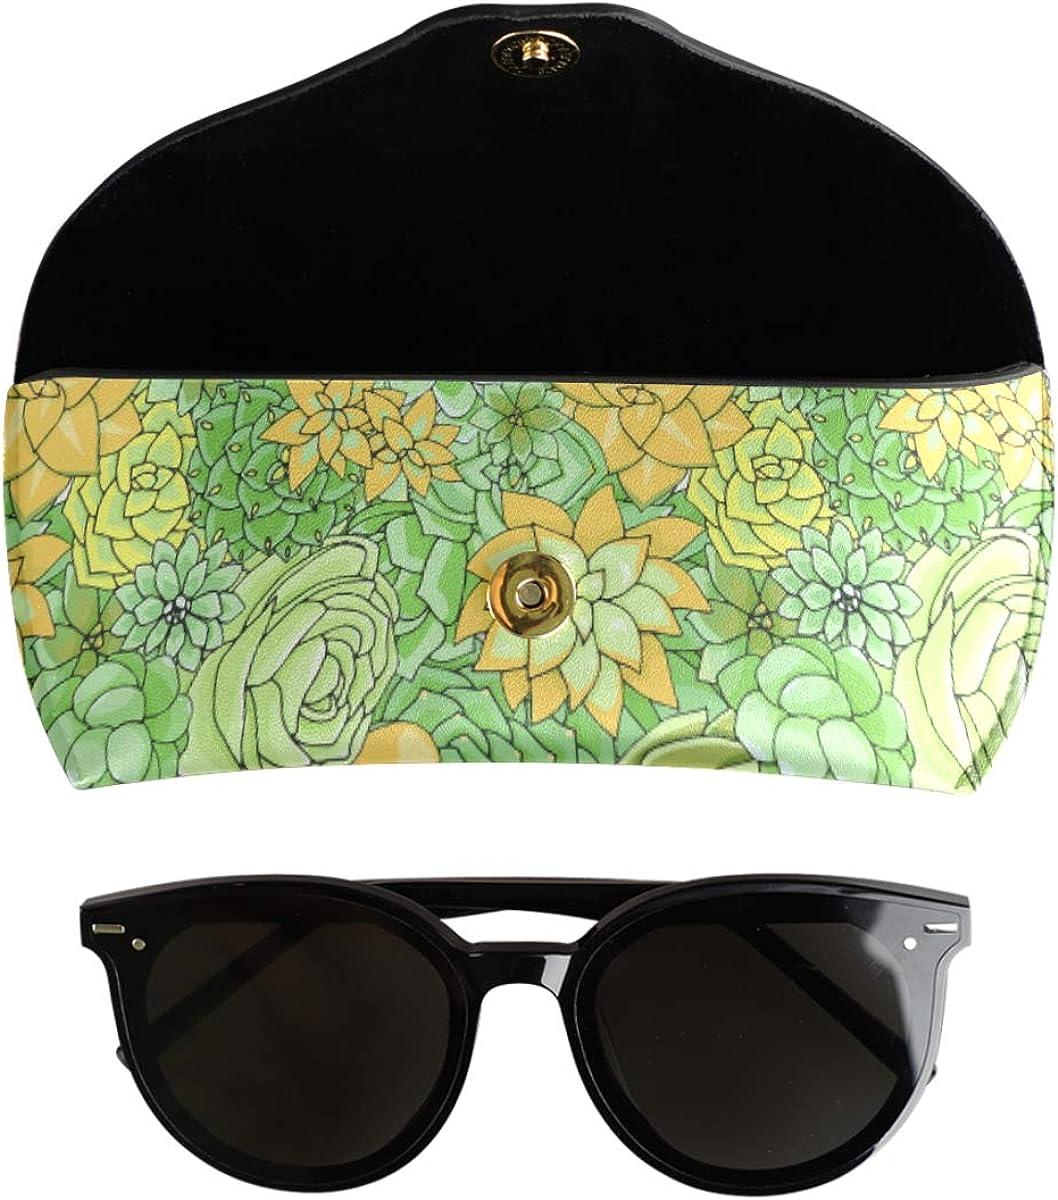 Succulents Multiuse present Goggles Bag Sunglasses Case Eyeglasses Pouch PU Leather Portable